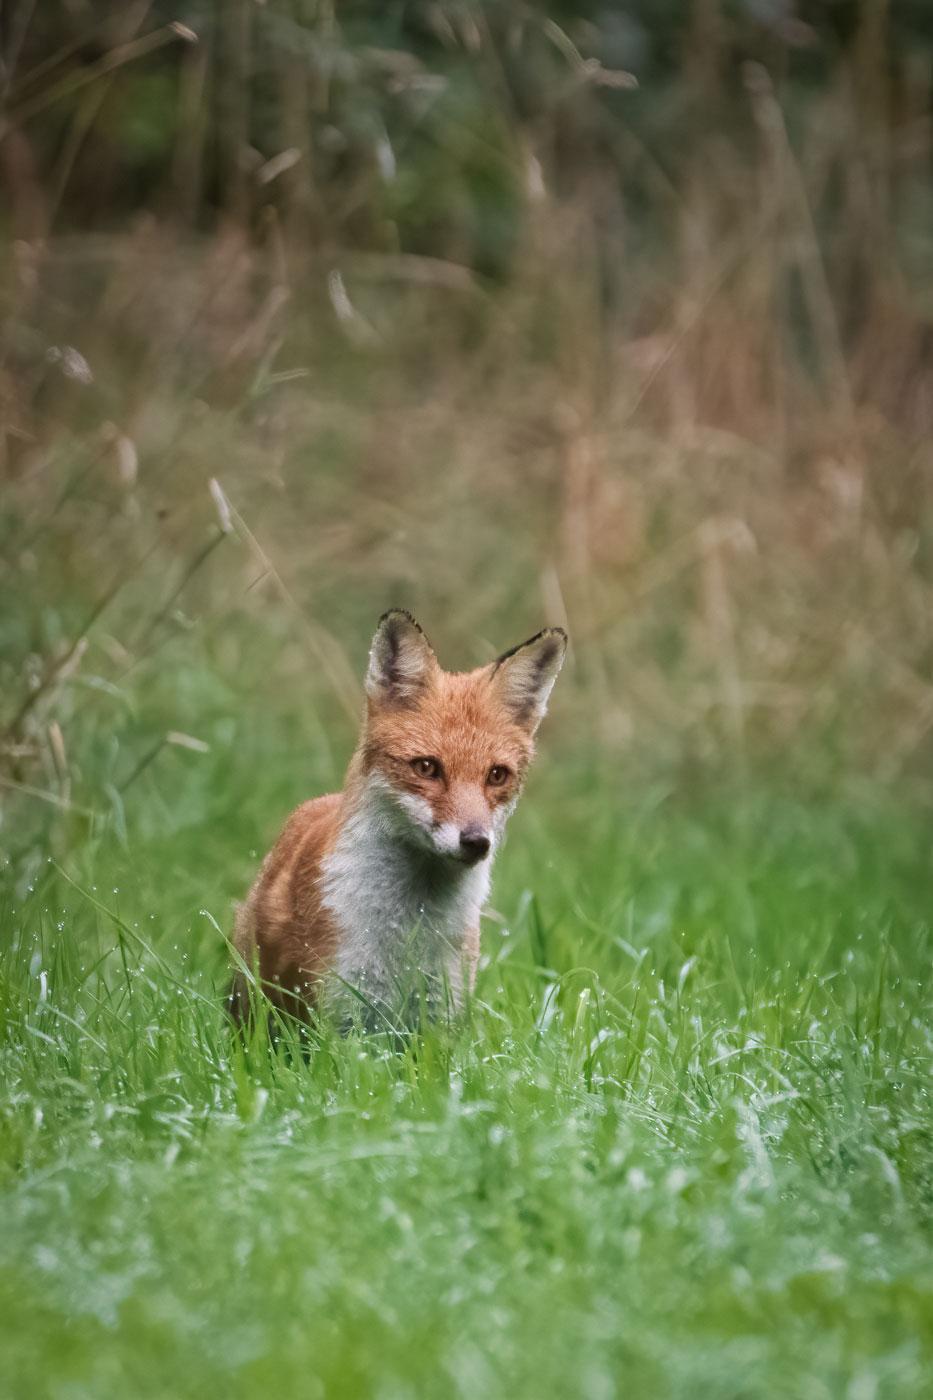 Vulpe rosie-Vulpea-vanatorul cu radarul perfect-Wildlife photography